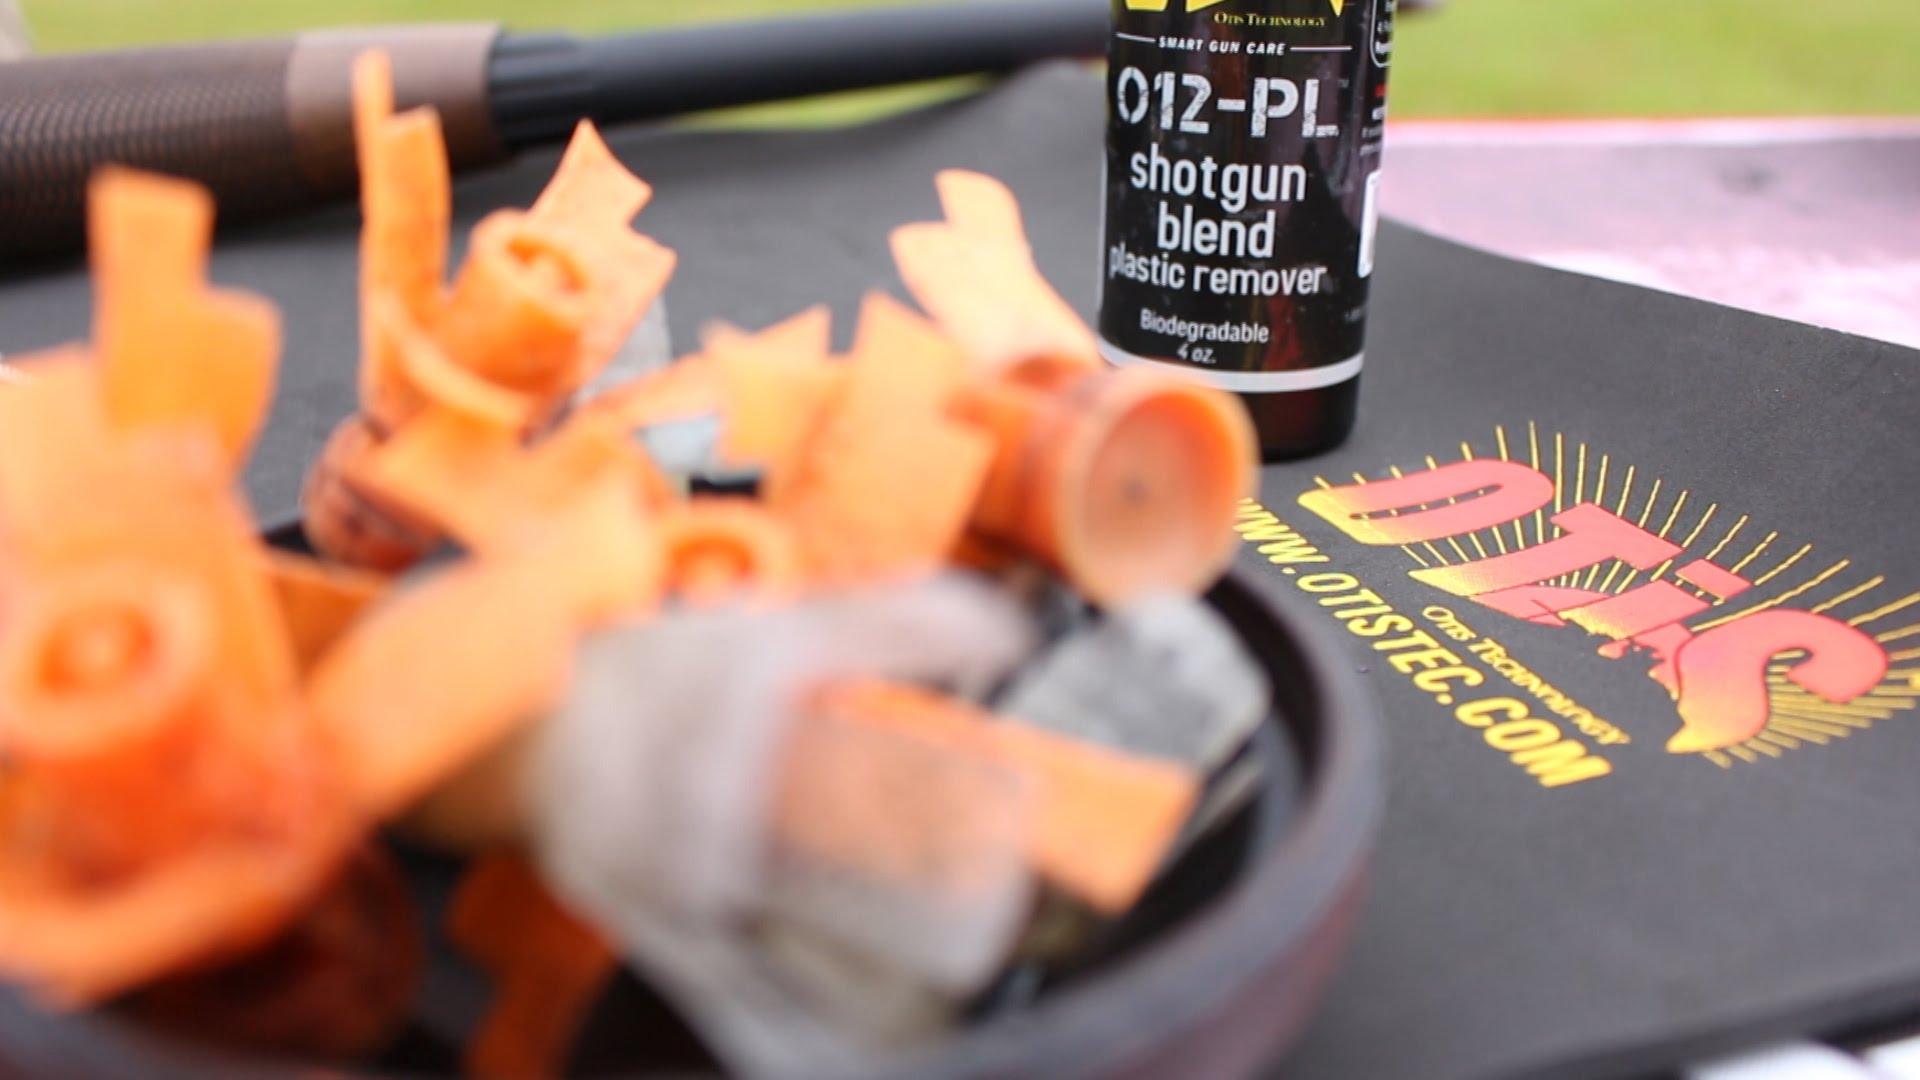 Using the Otis O-12 Shotgun Blend Plastic Remover -  Smart Gun Care